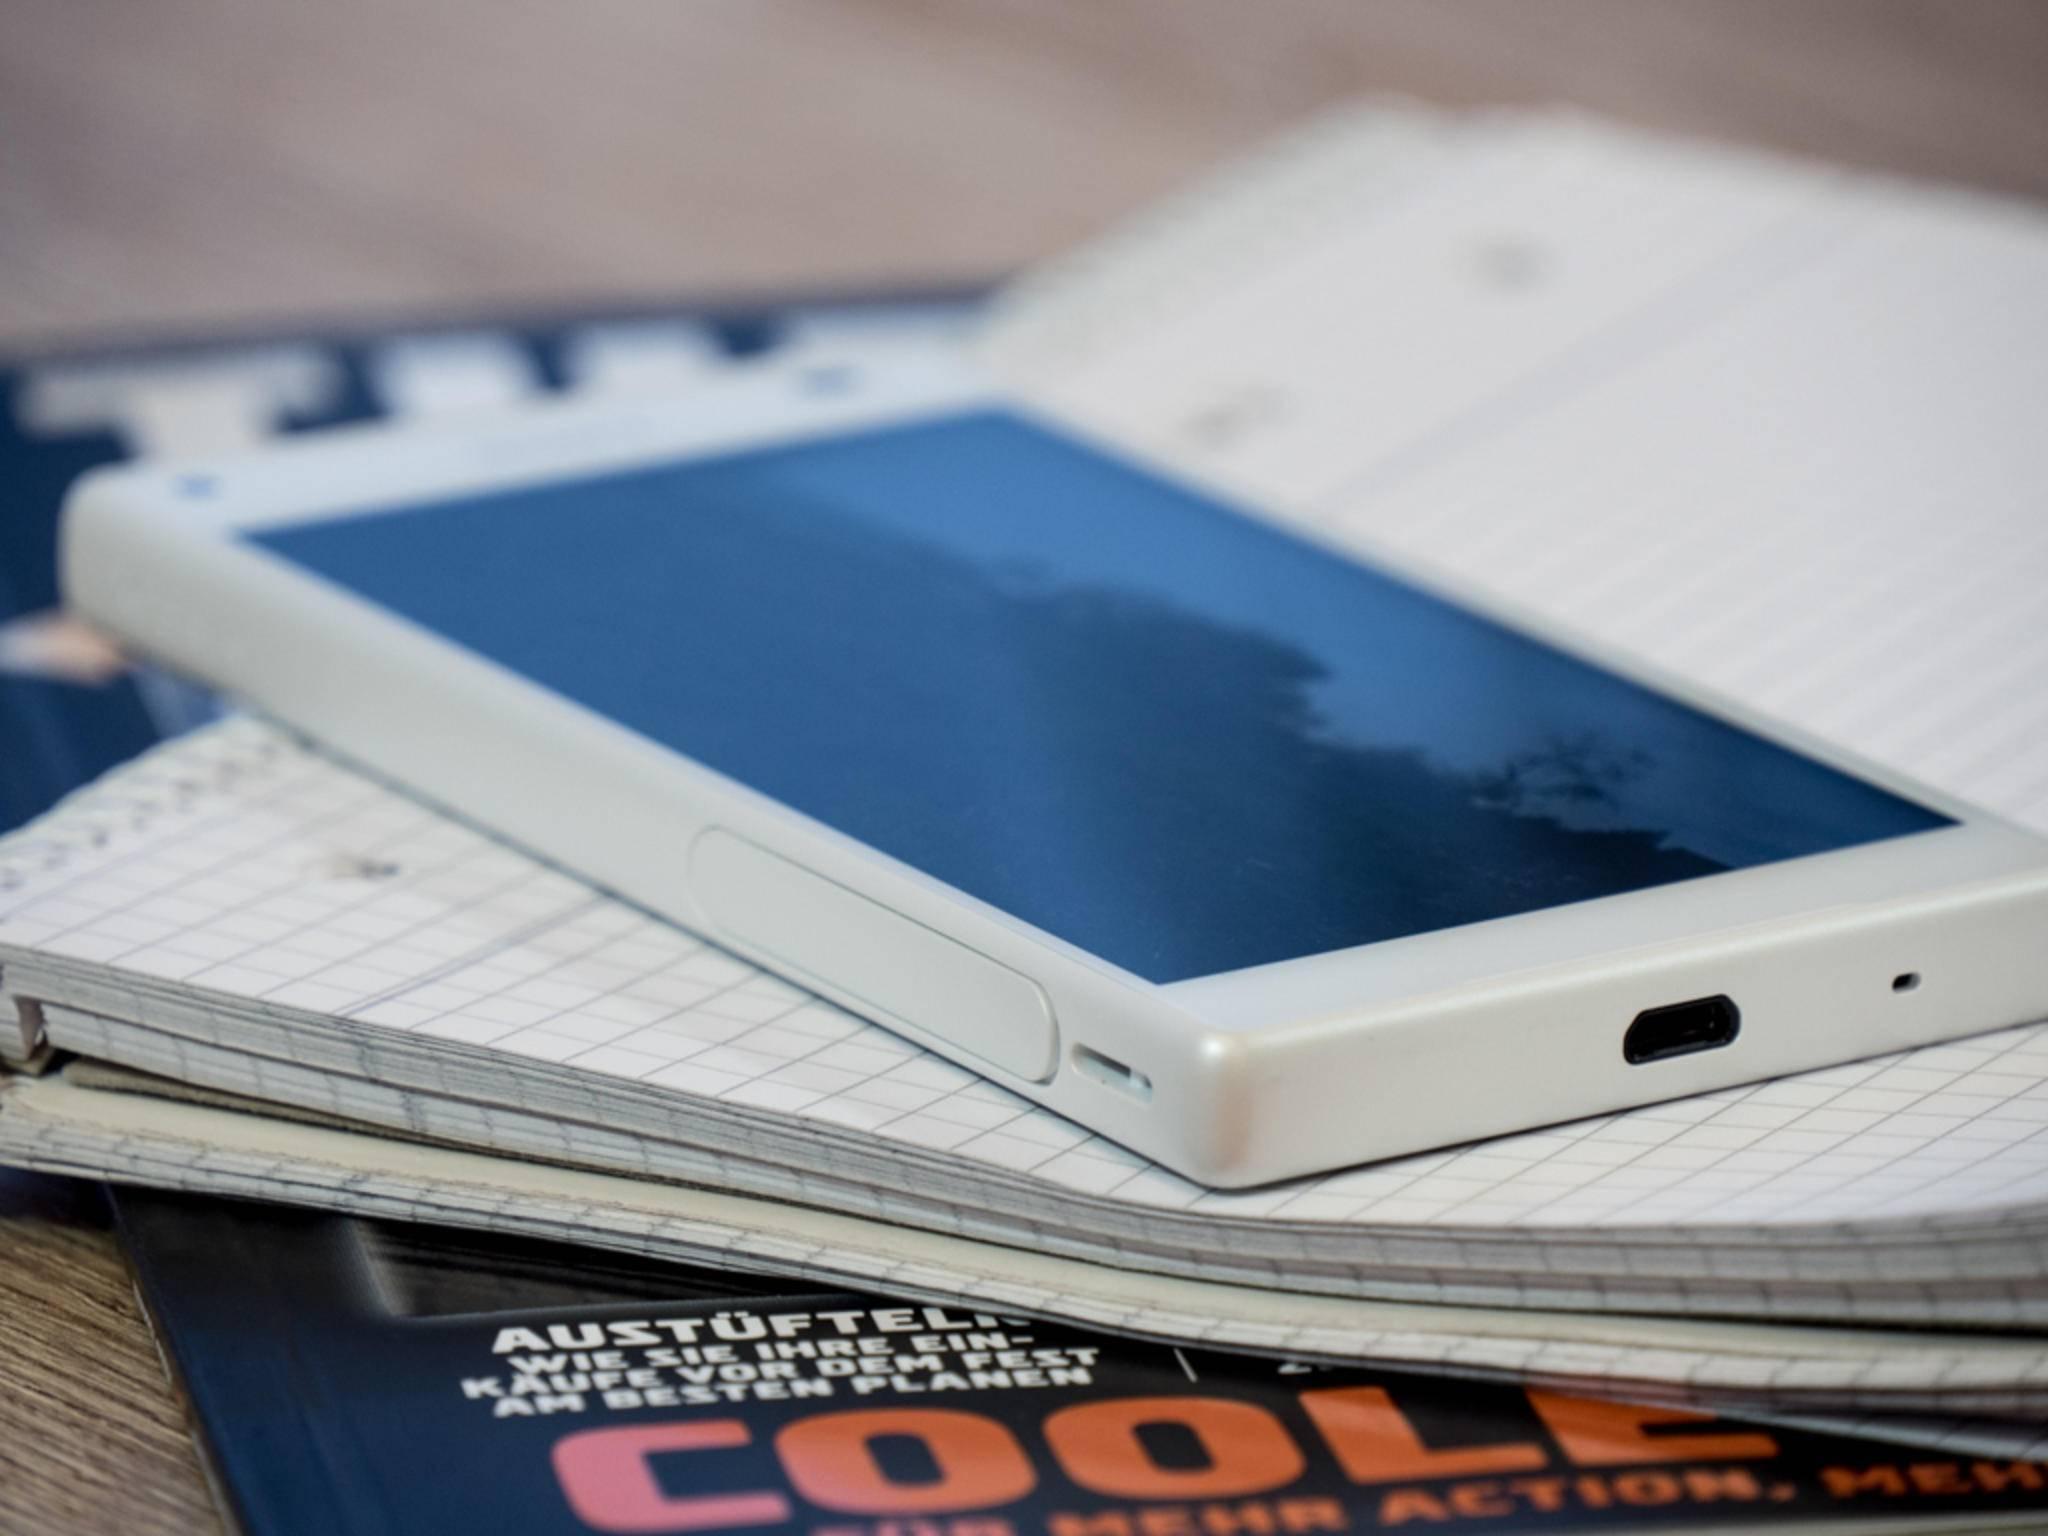 Das Sony Xperia Z5 Compact besitzt ein 4,6 Zoll-Display.